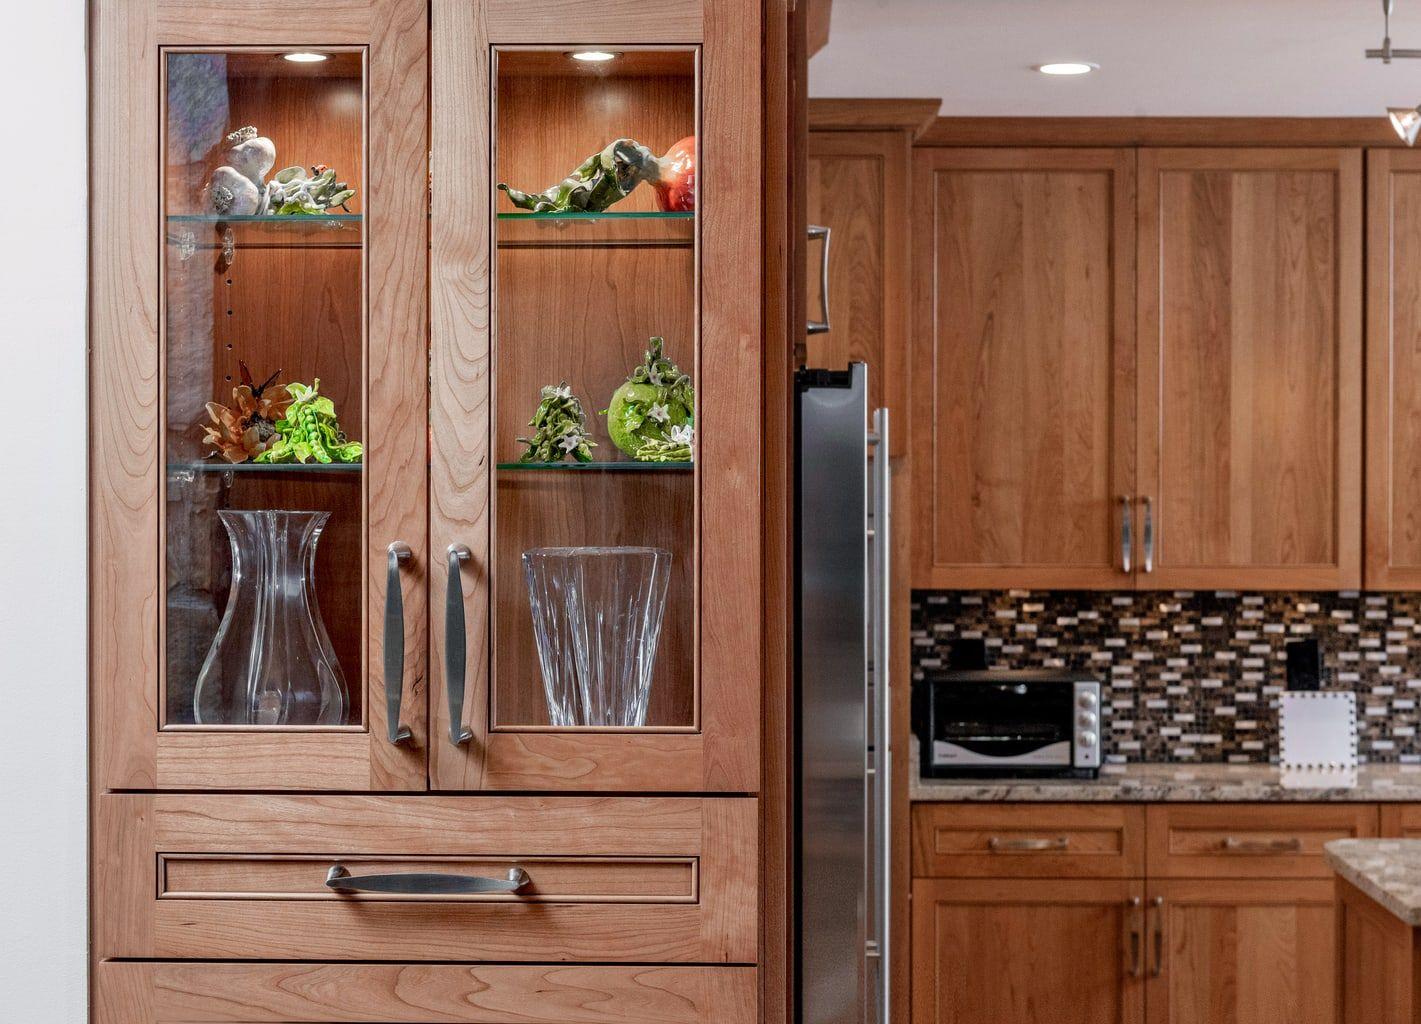 Great Falls Va K S Renewal Systems Llc Kitchen Display Kitchen Cabinets Kitchen Refinishing